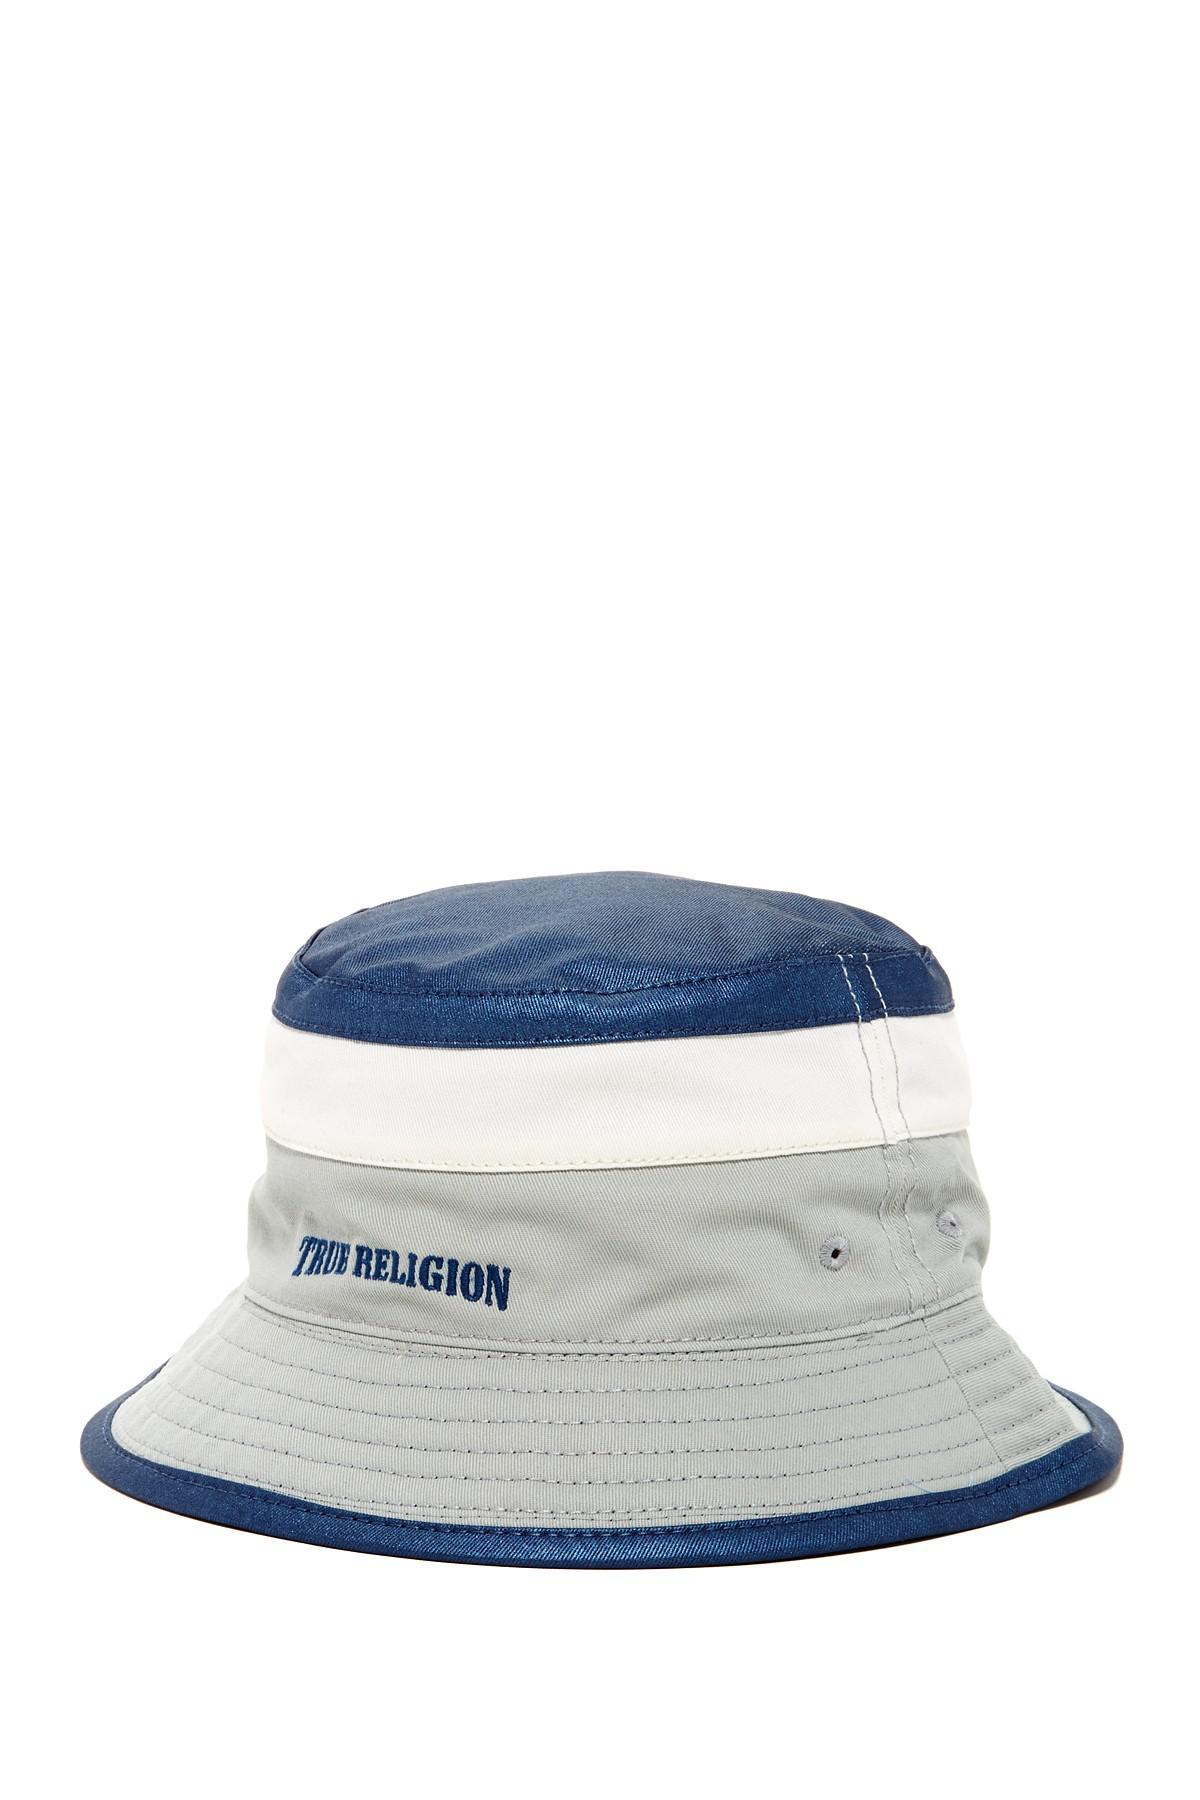 Lyst - True Religion Reversible Colorblock Bucket Hat in Blue for Men 422245552e27